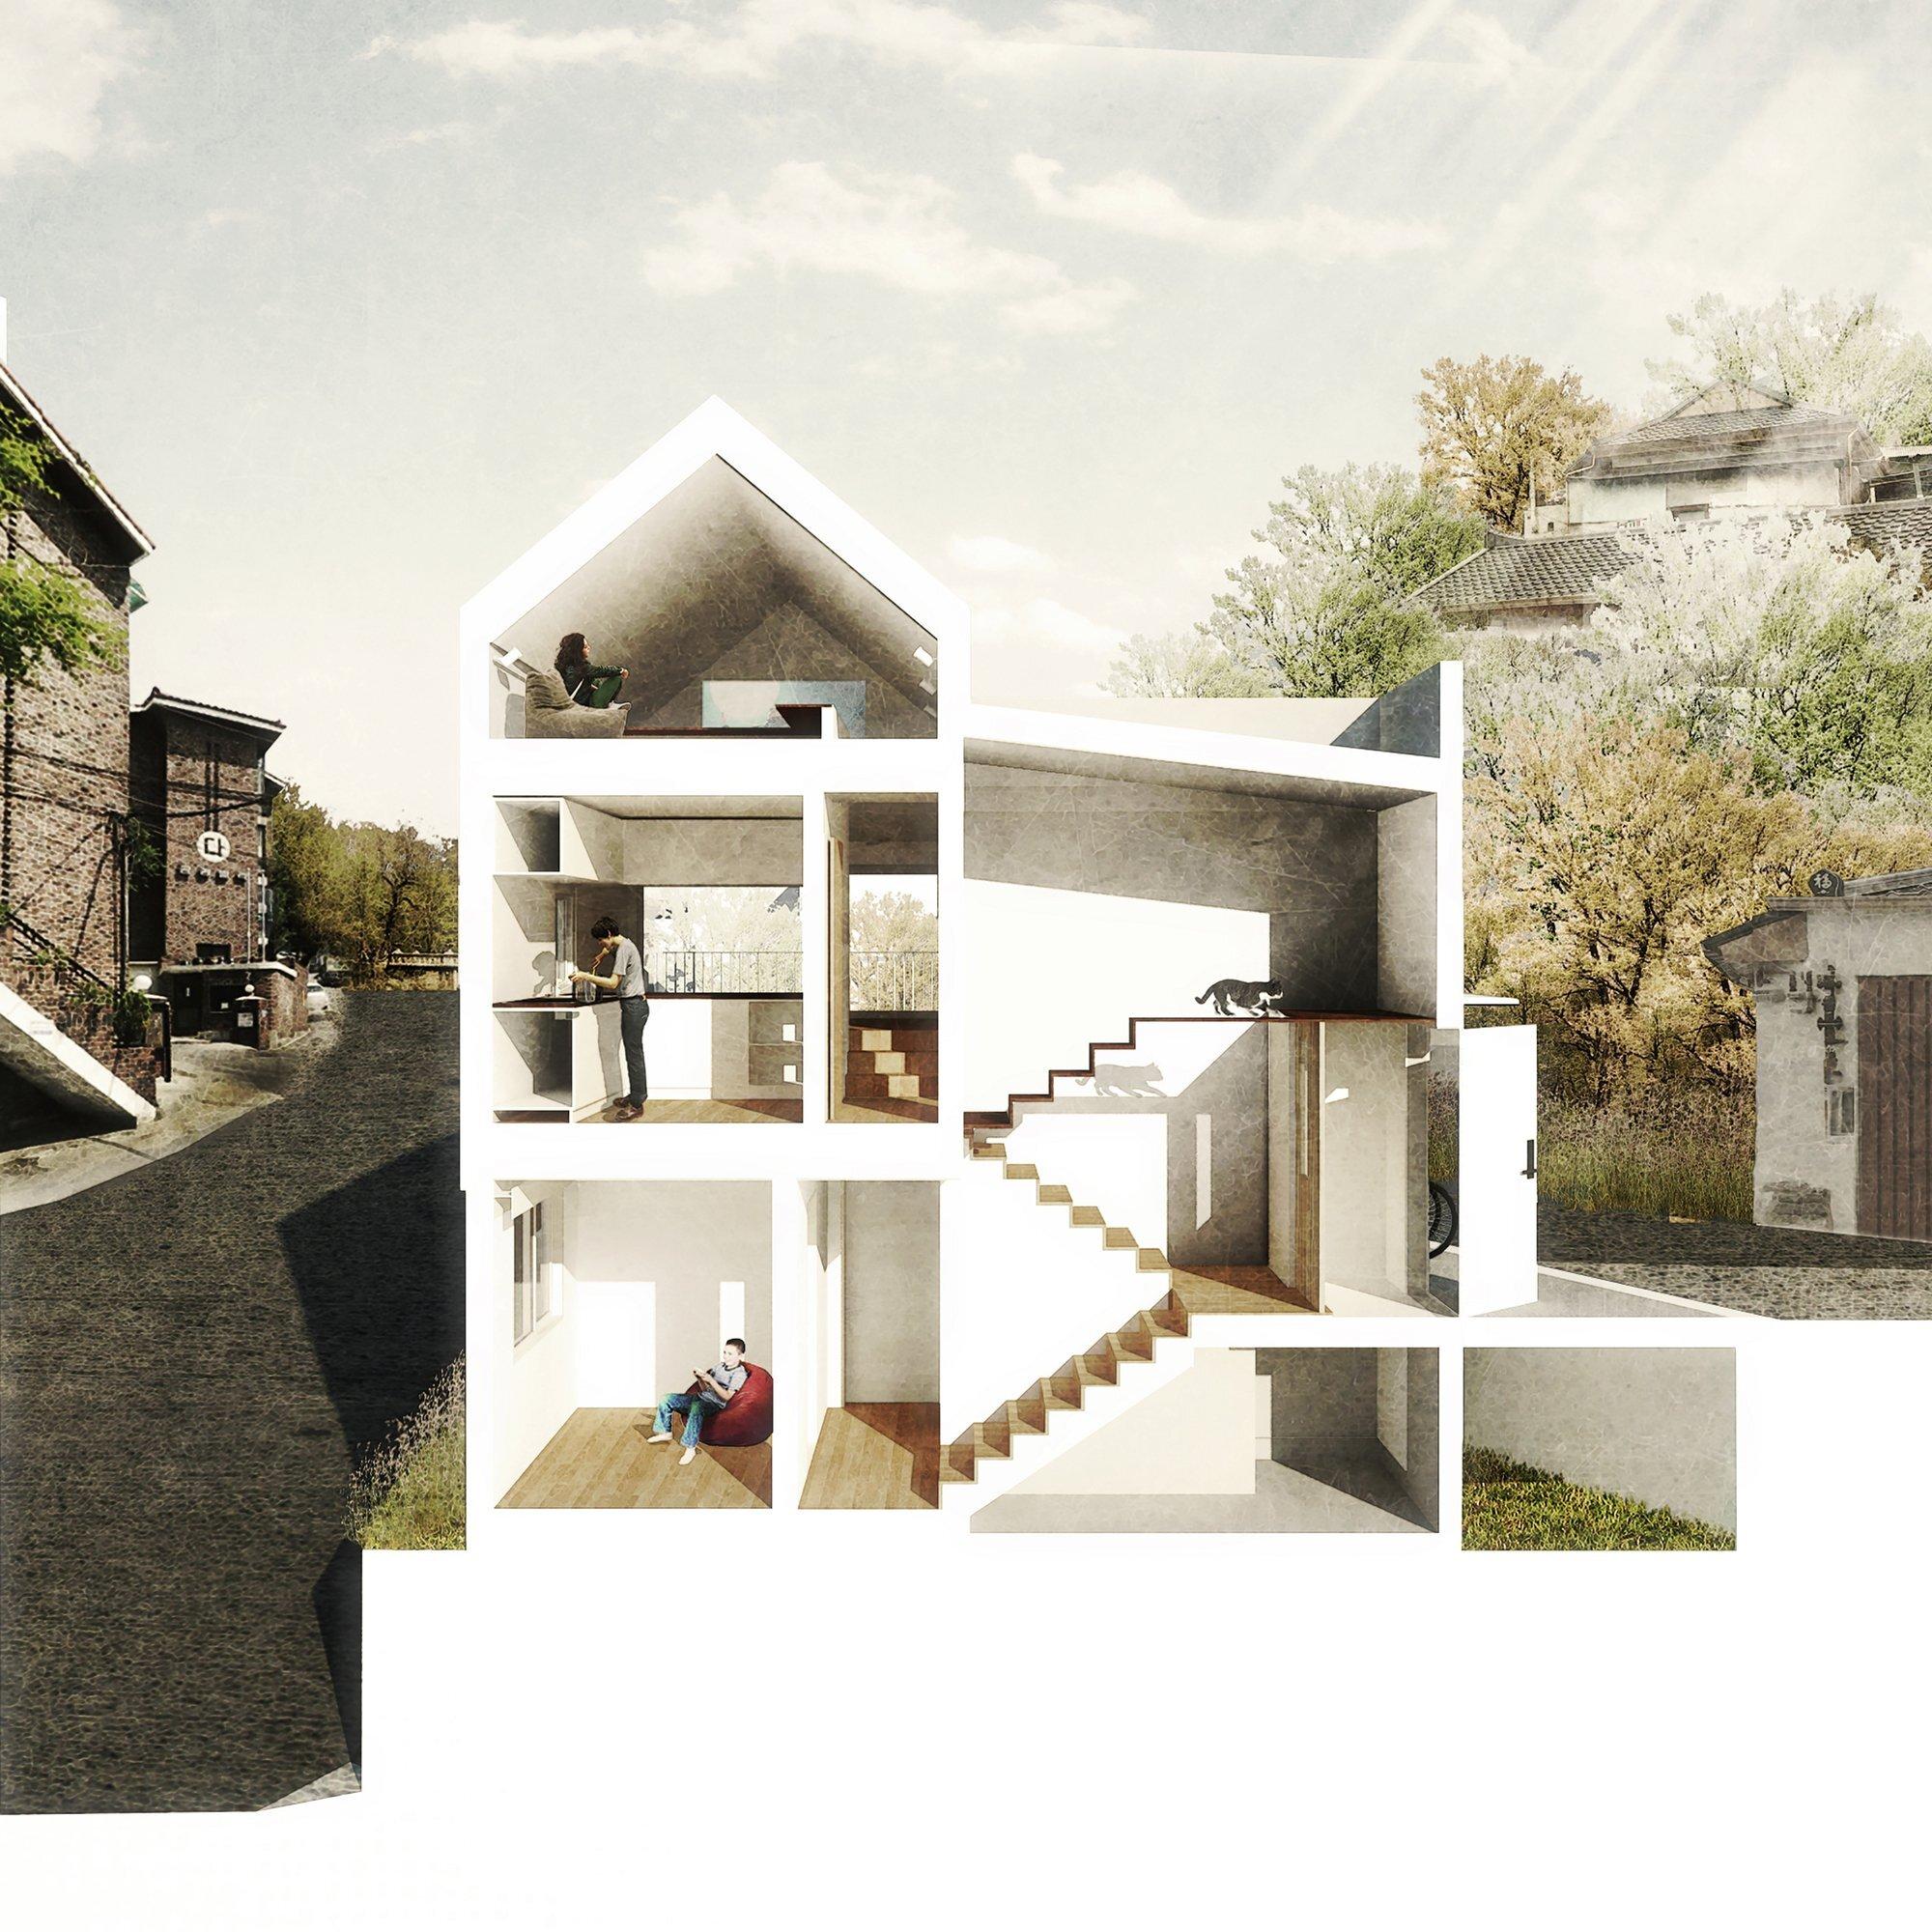 50m2 House - OBBA - Seoul - Cross-Section - Humble Homes